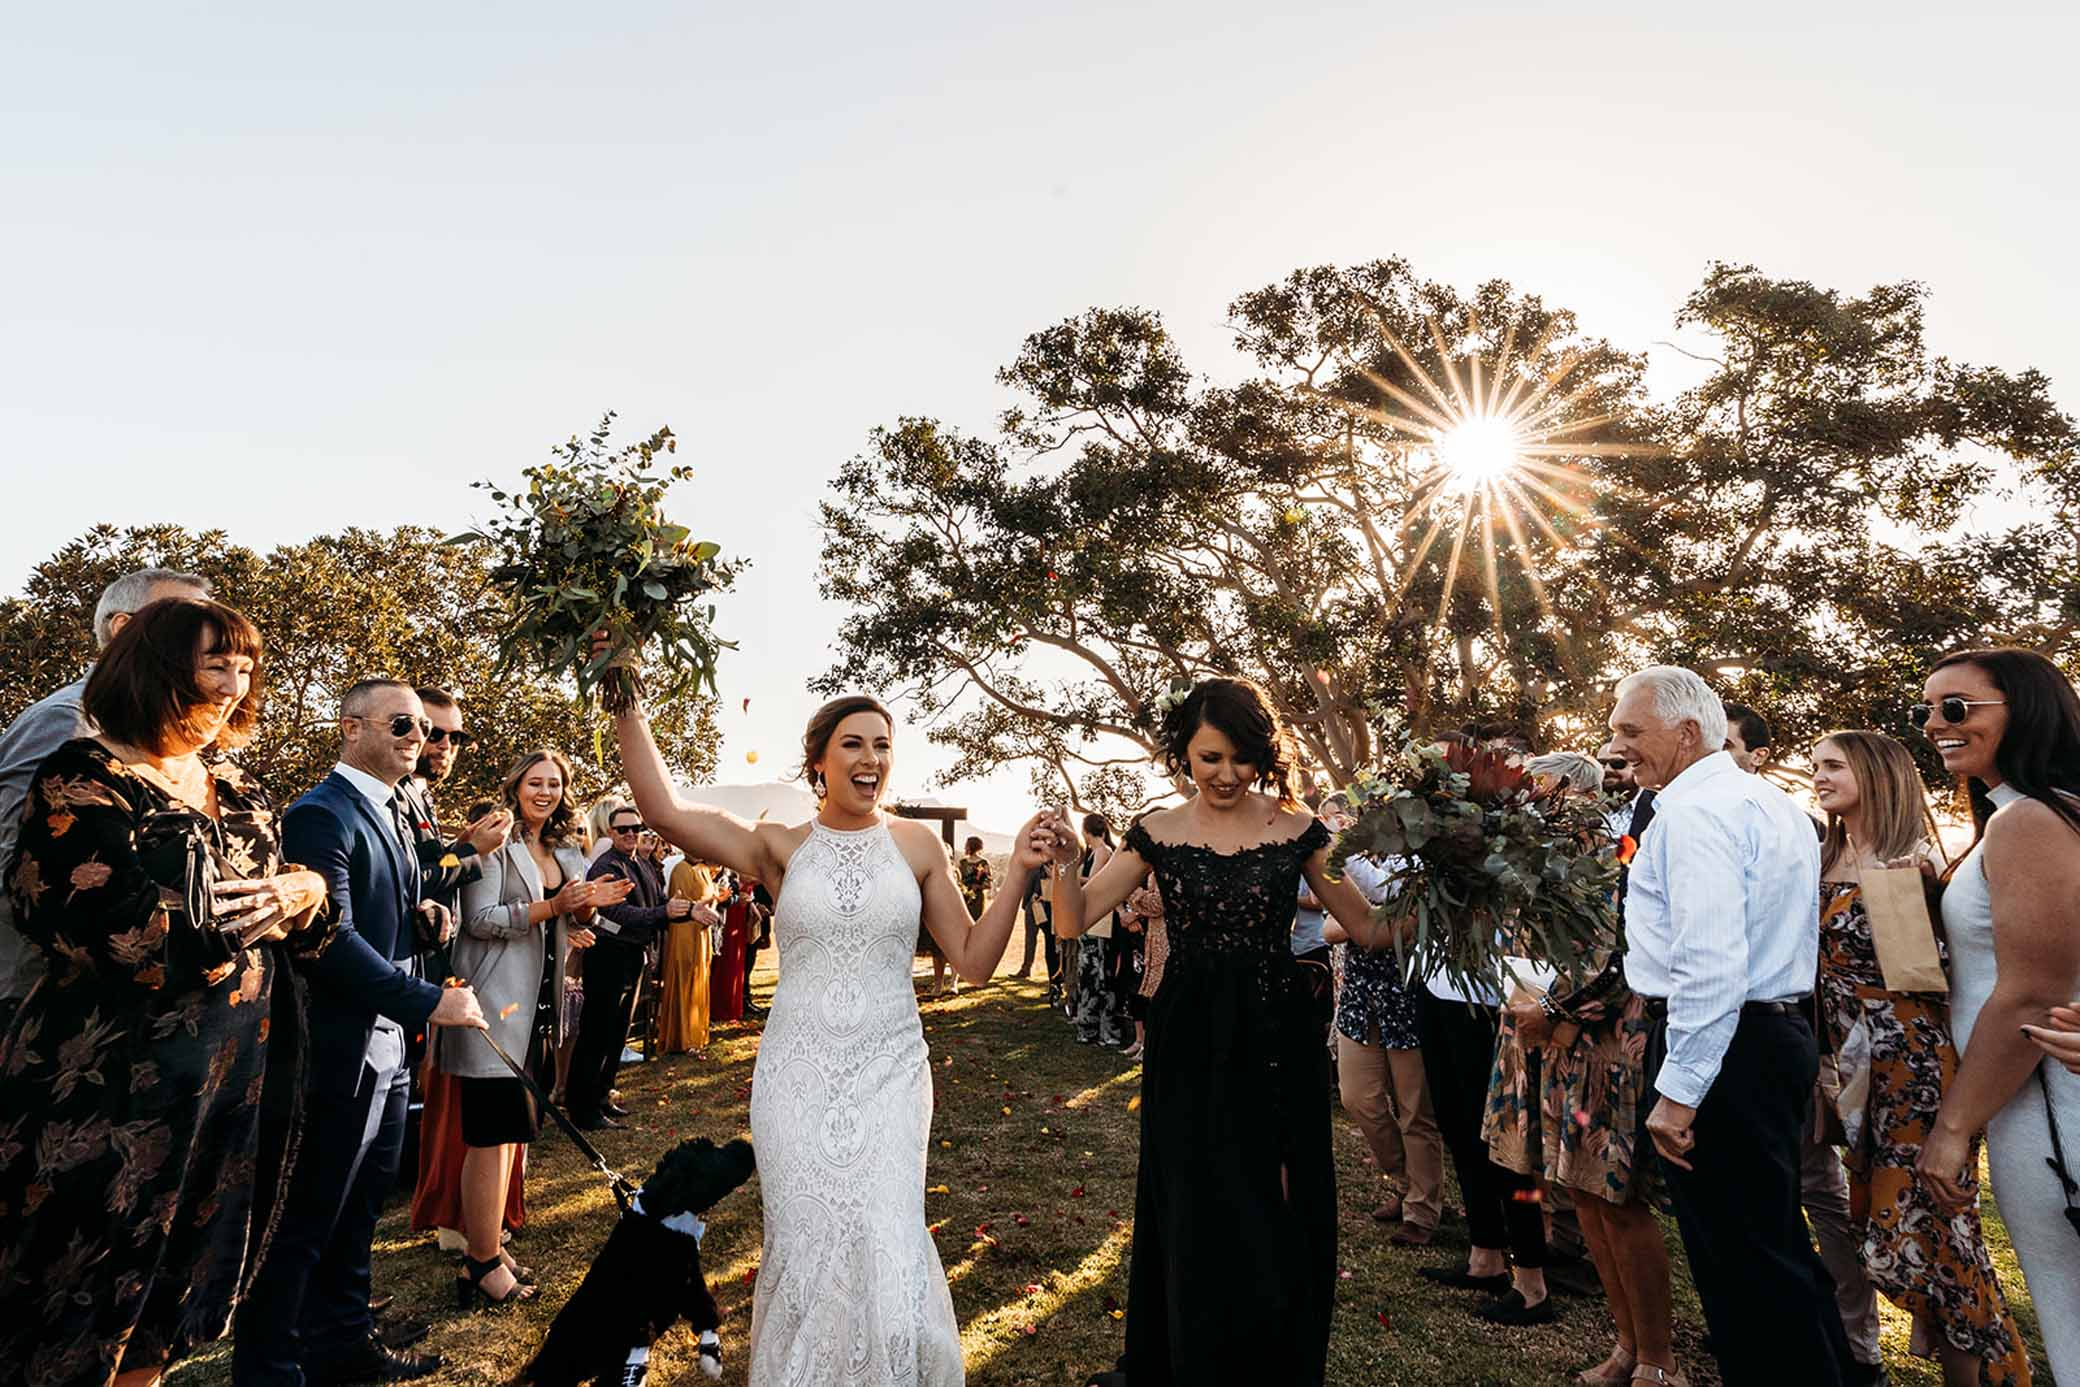 Margan Photography Woollongong Sydney Blue Mountains Australia lesbian gay lgbtqia love wedding elopement engagement photos